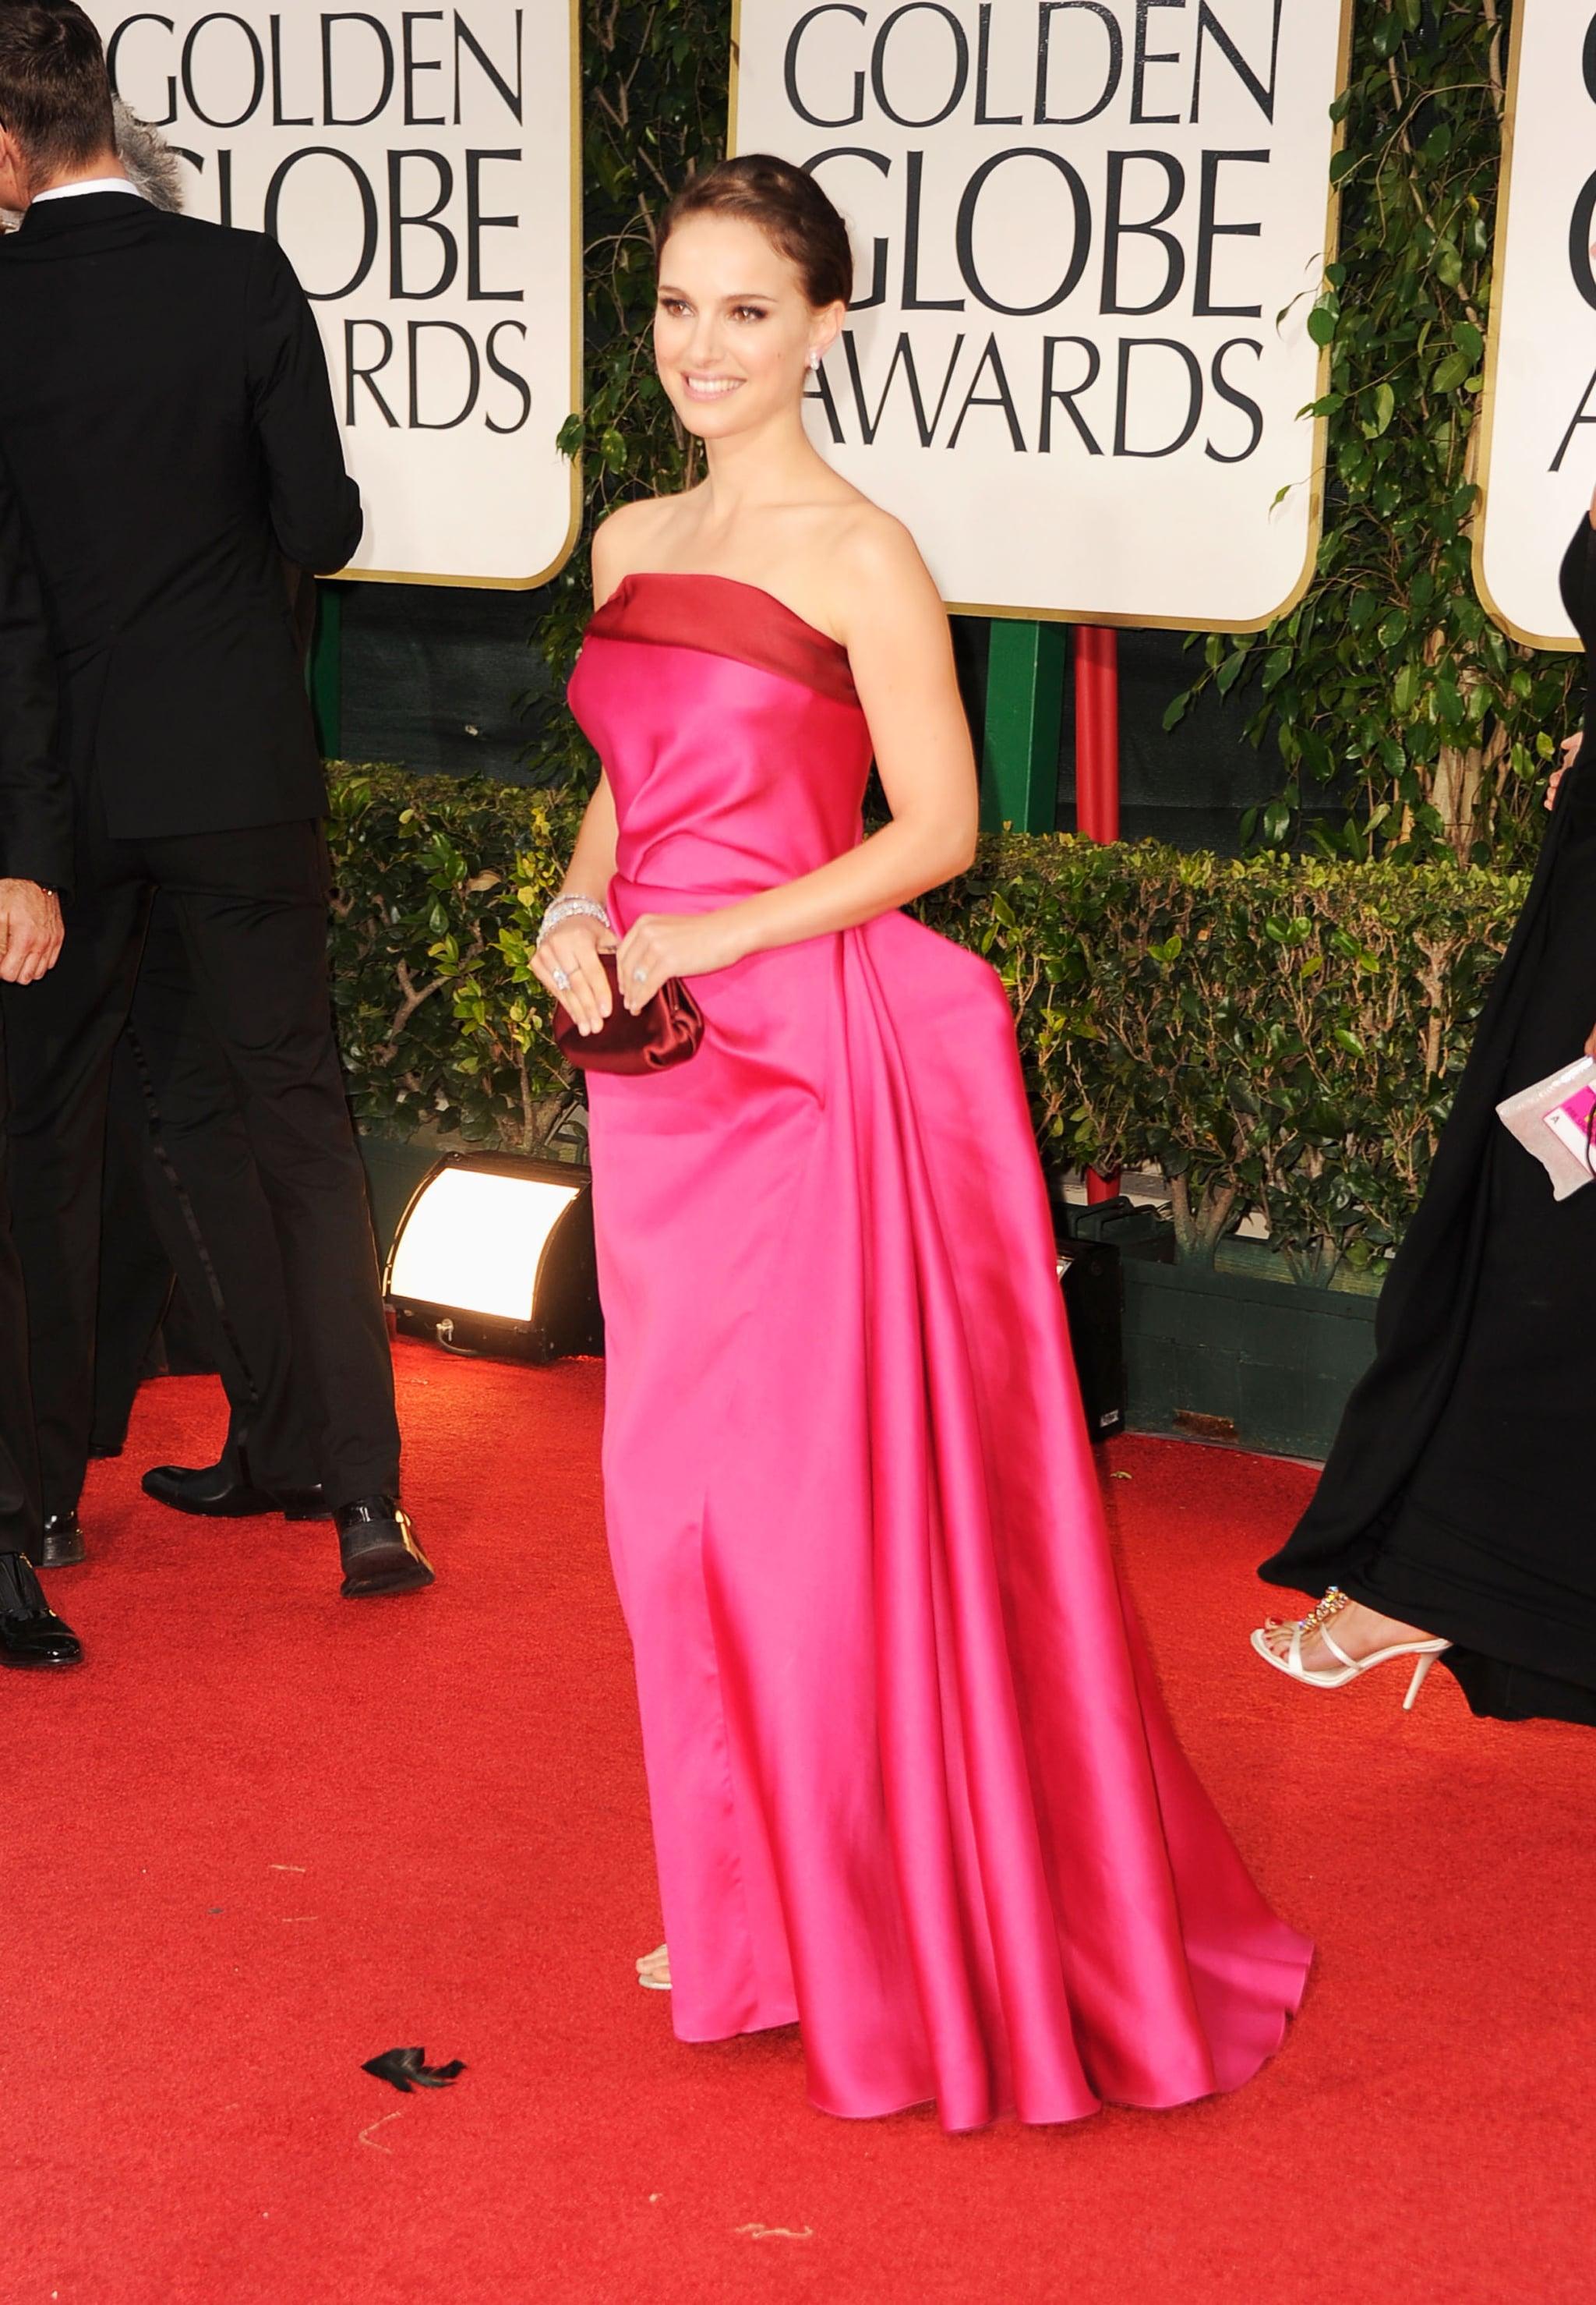 Natalie Portman at the Golden Globes.